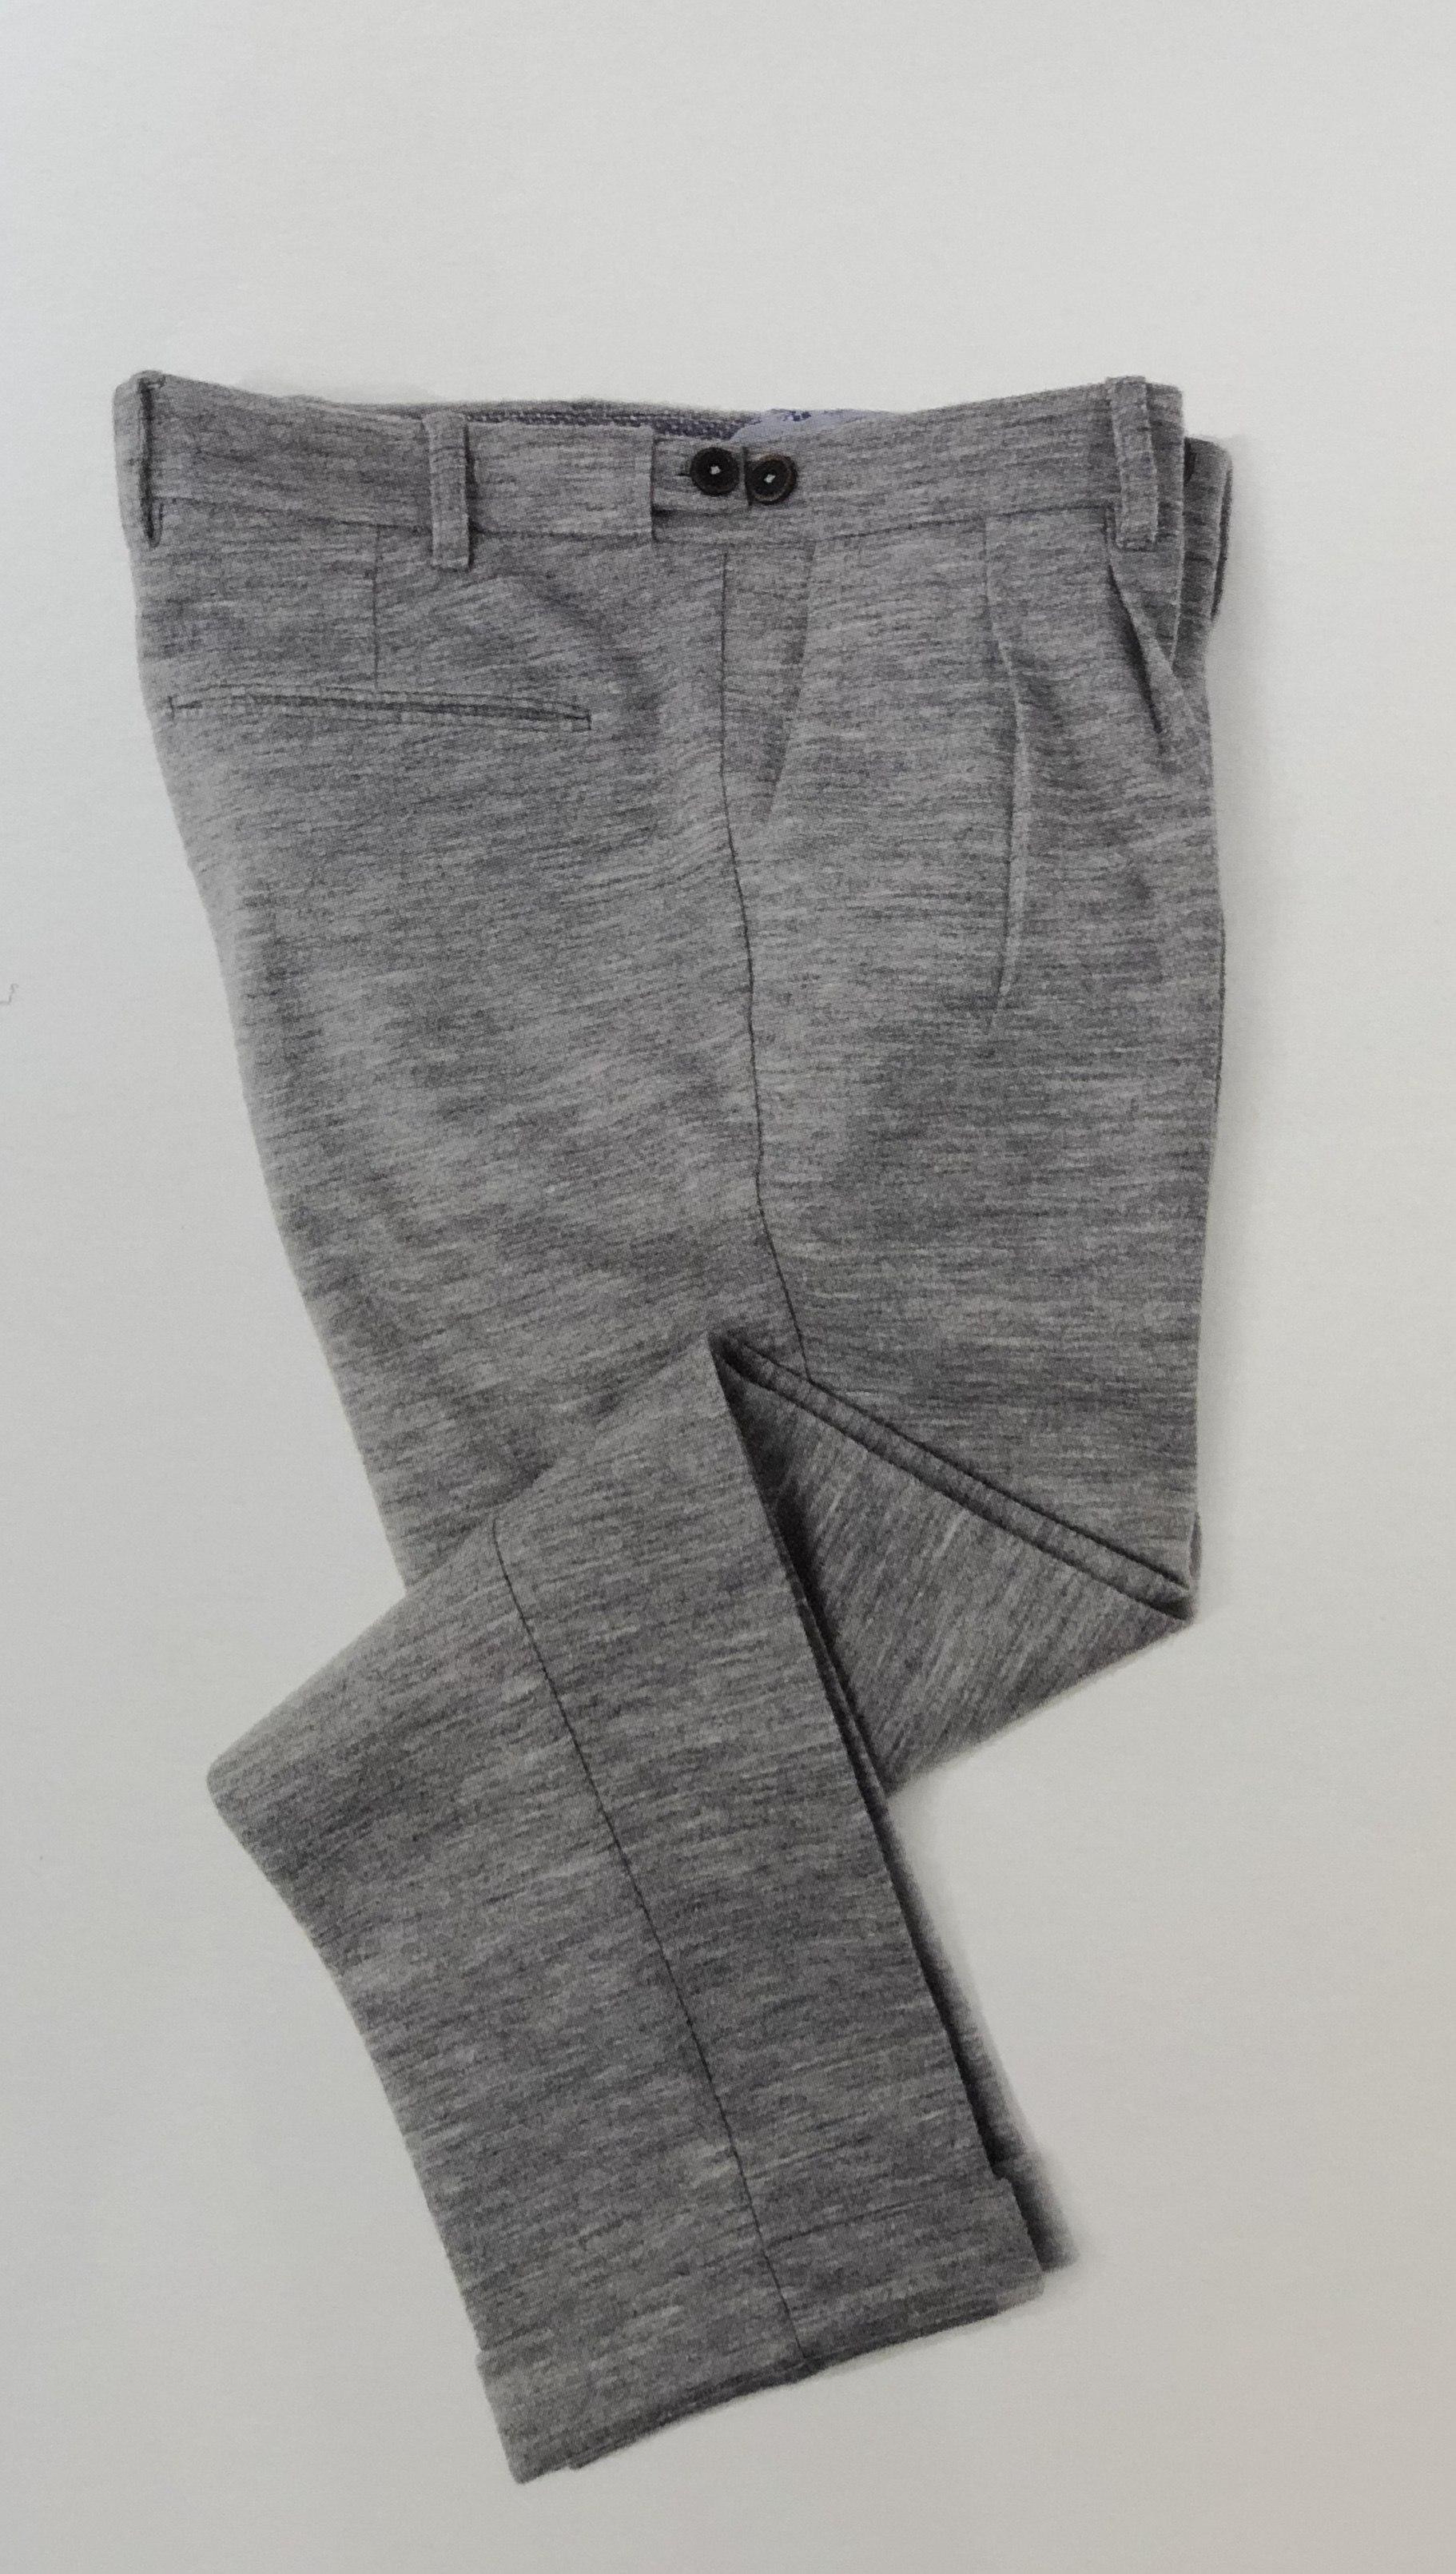 Pantalon gris clair - Christian Ambrosio